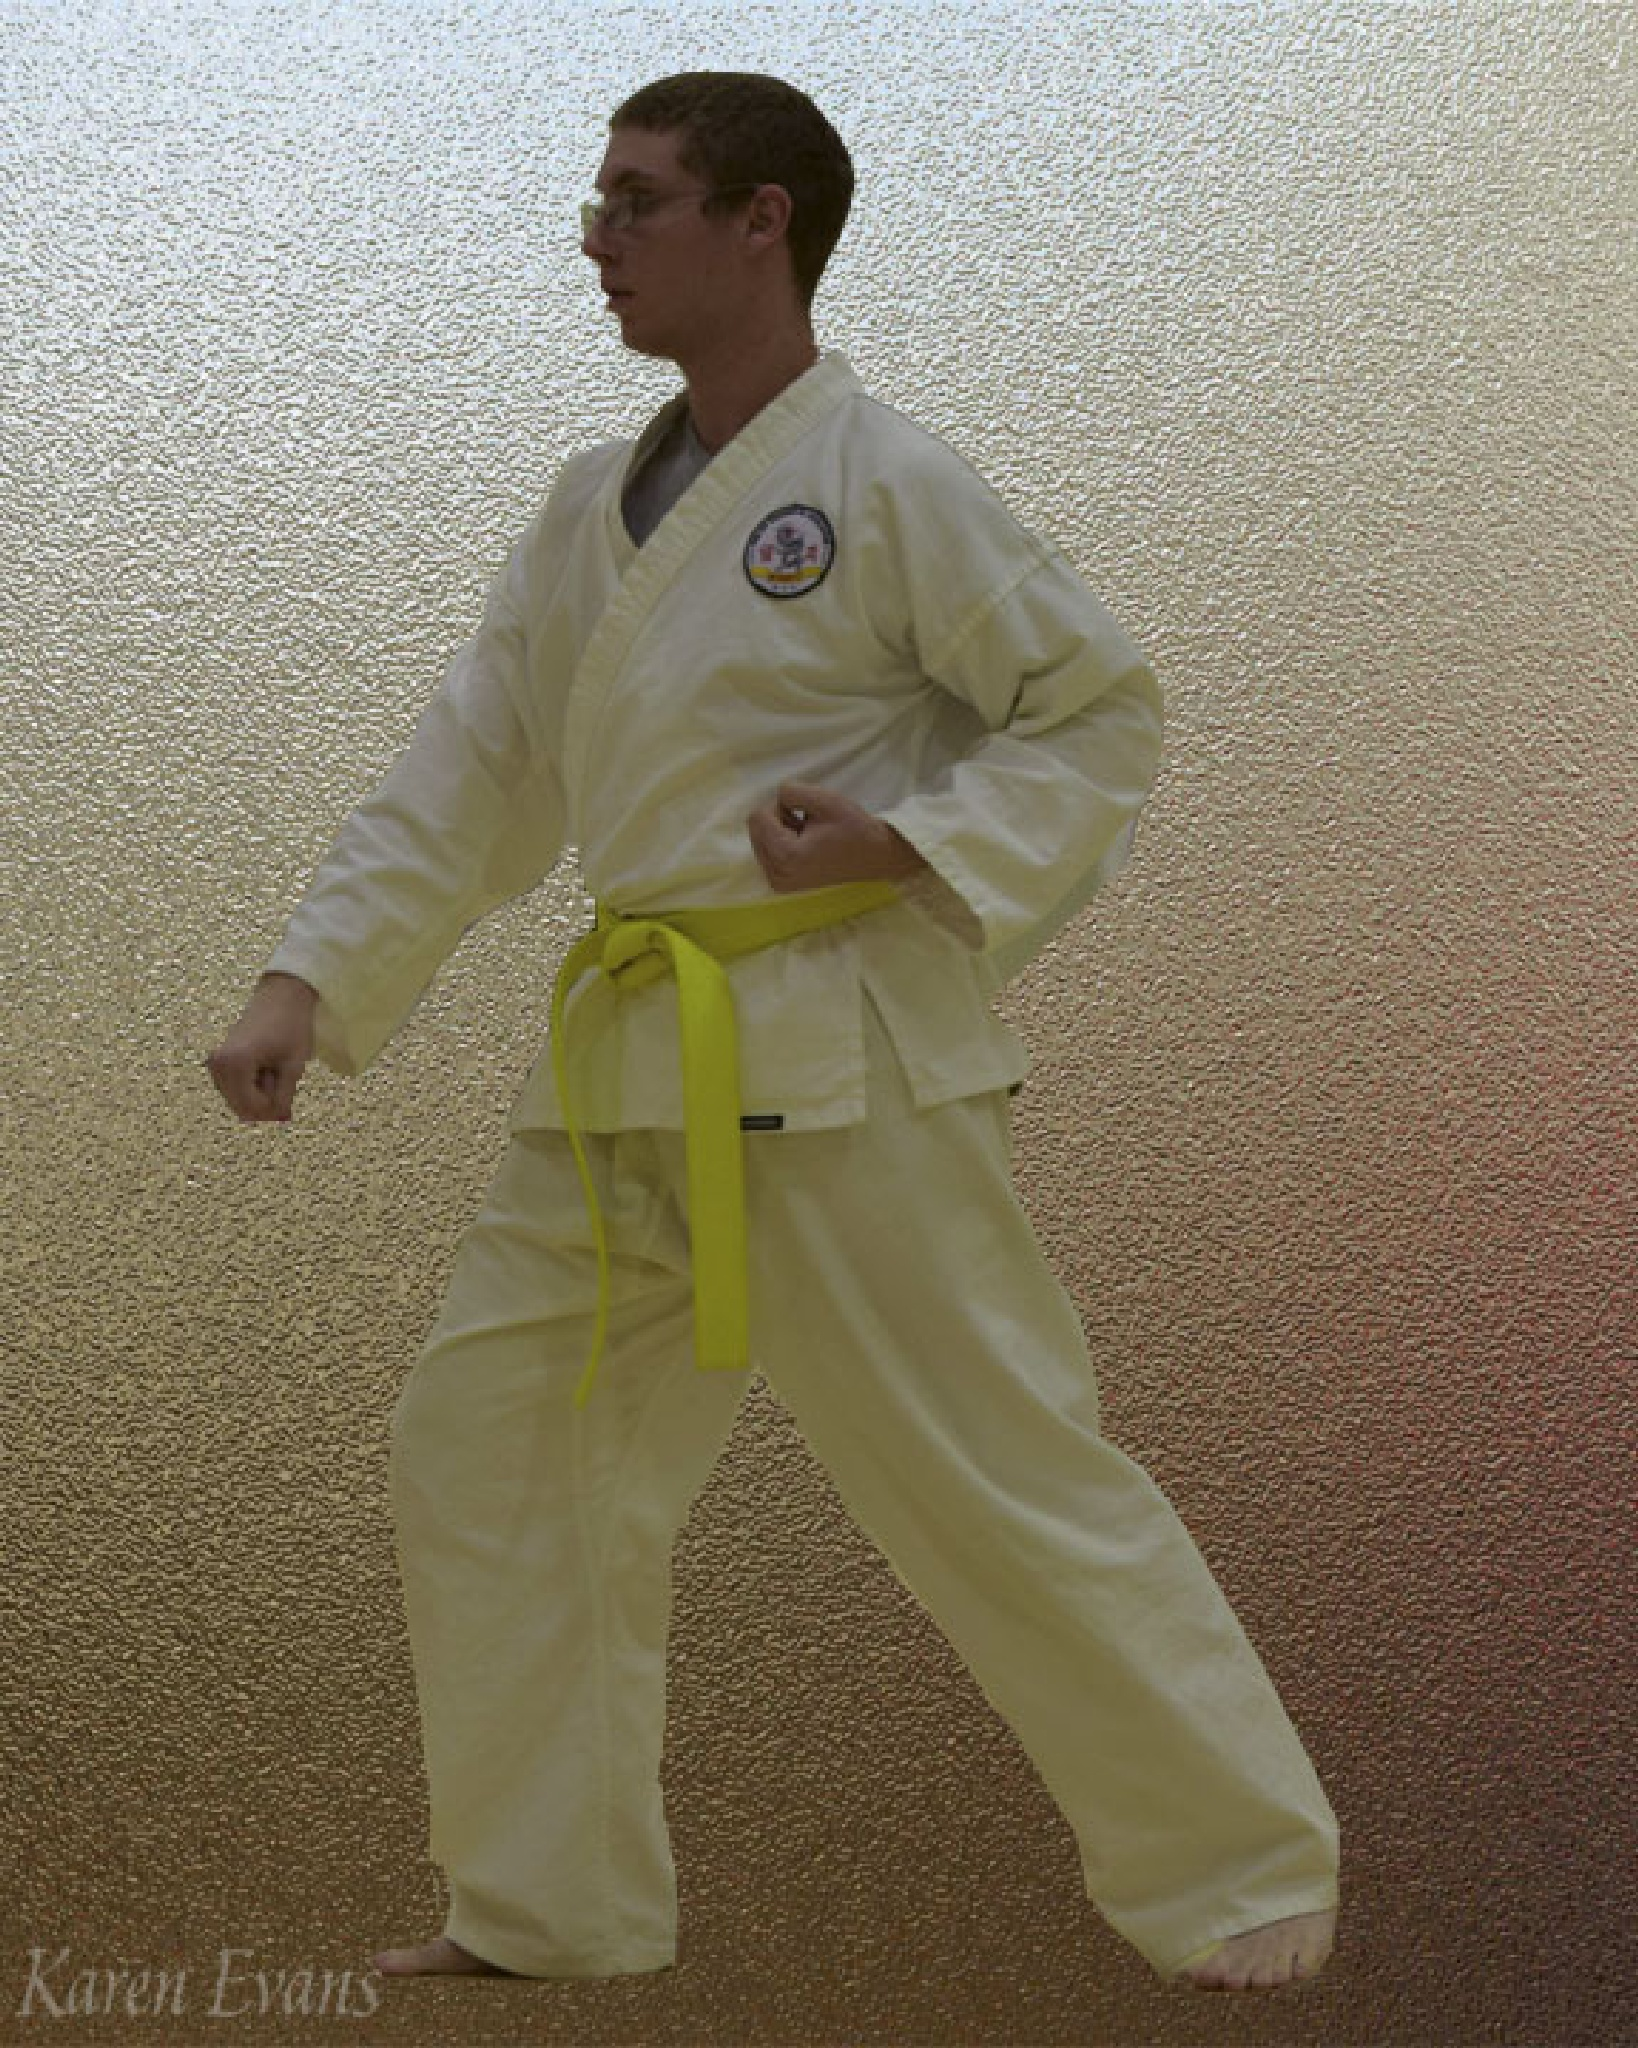 tae kwon do stance by Karen Evans